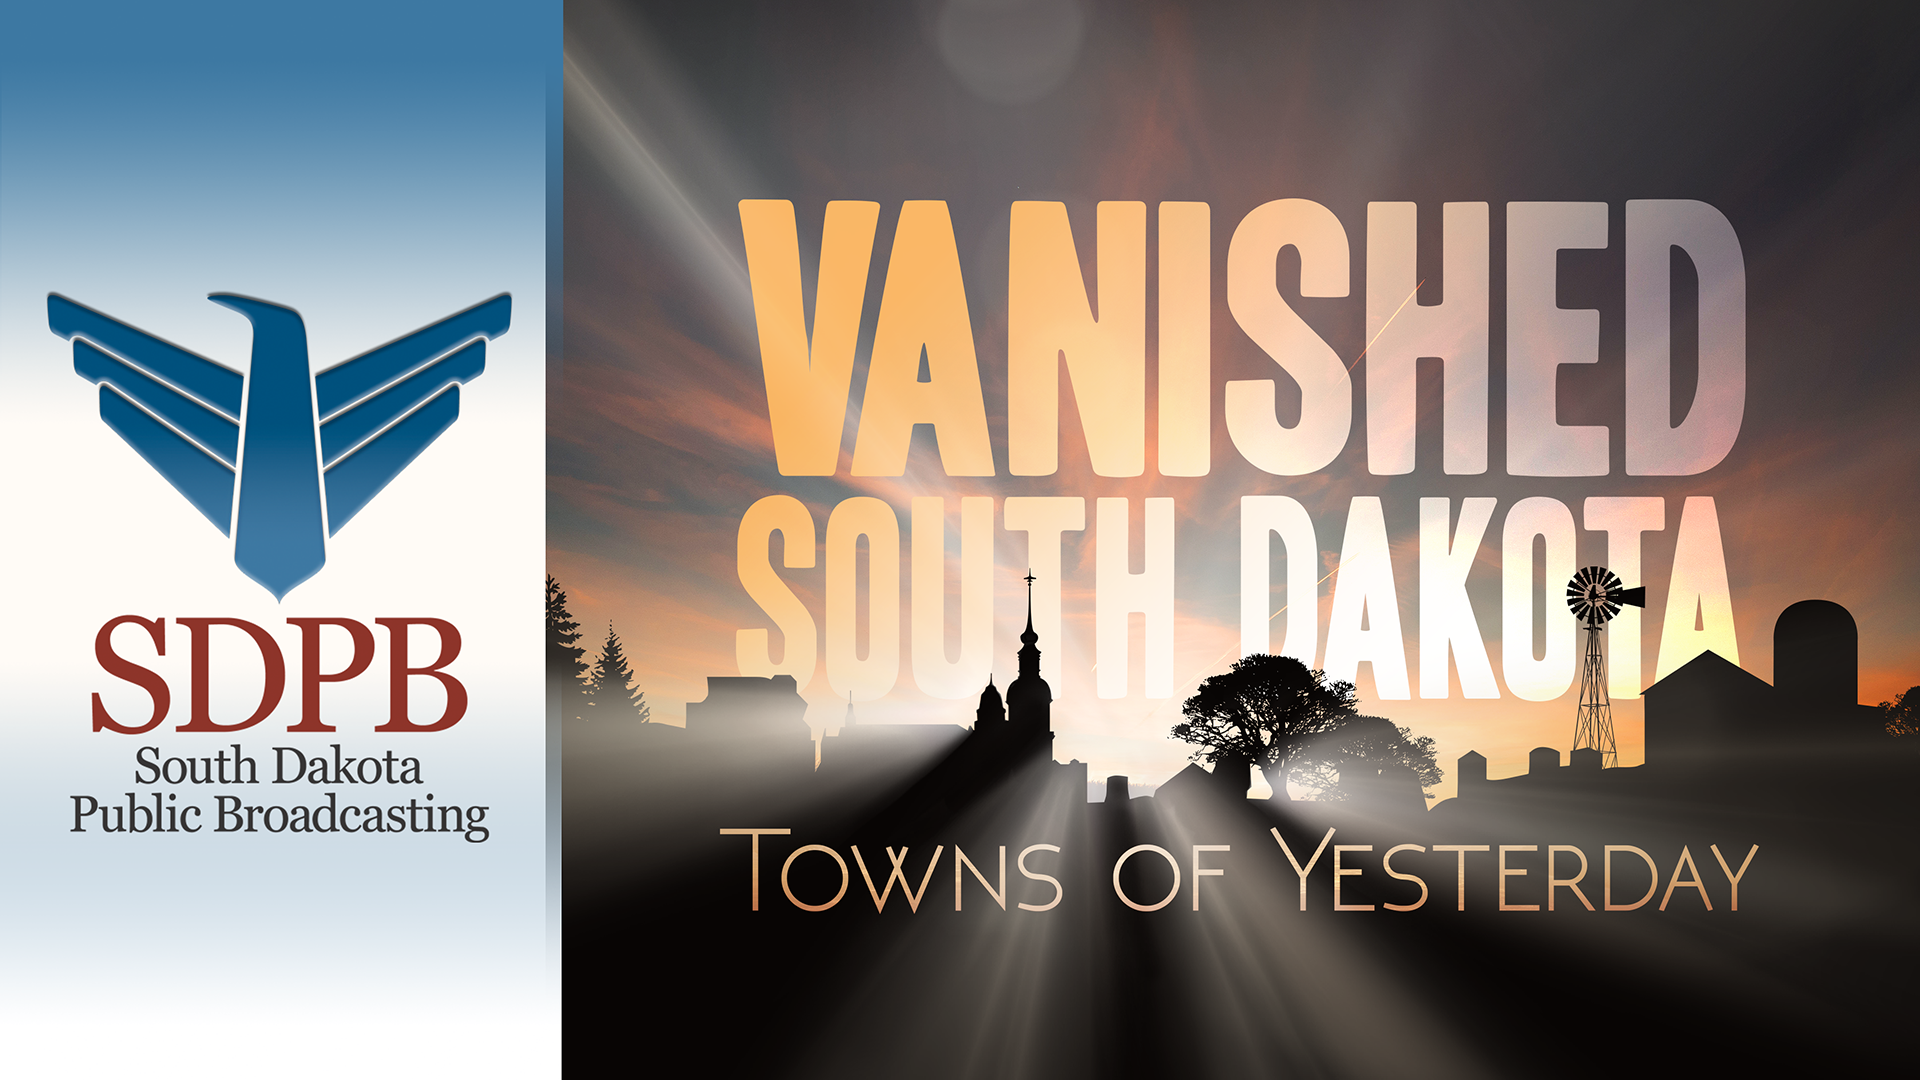 VANISHED SOUTH DAKOTA: Summer Screenings